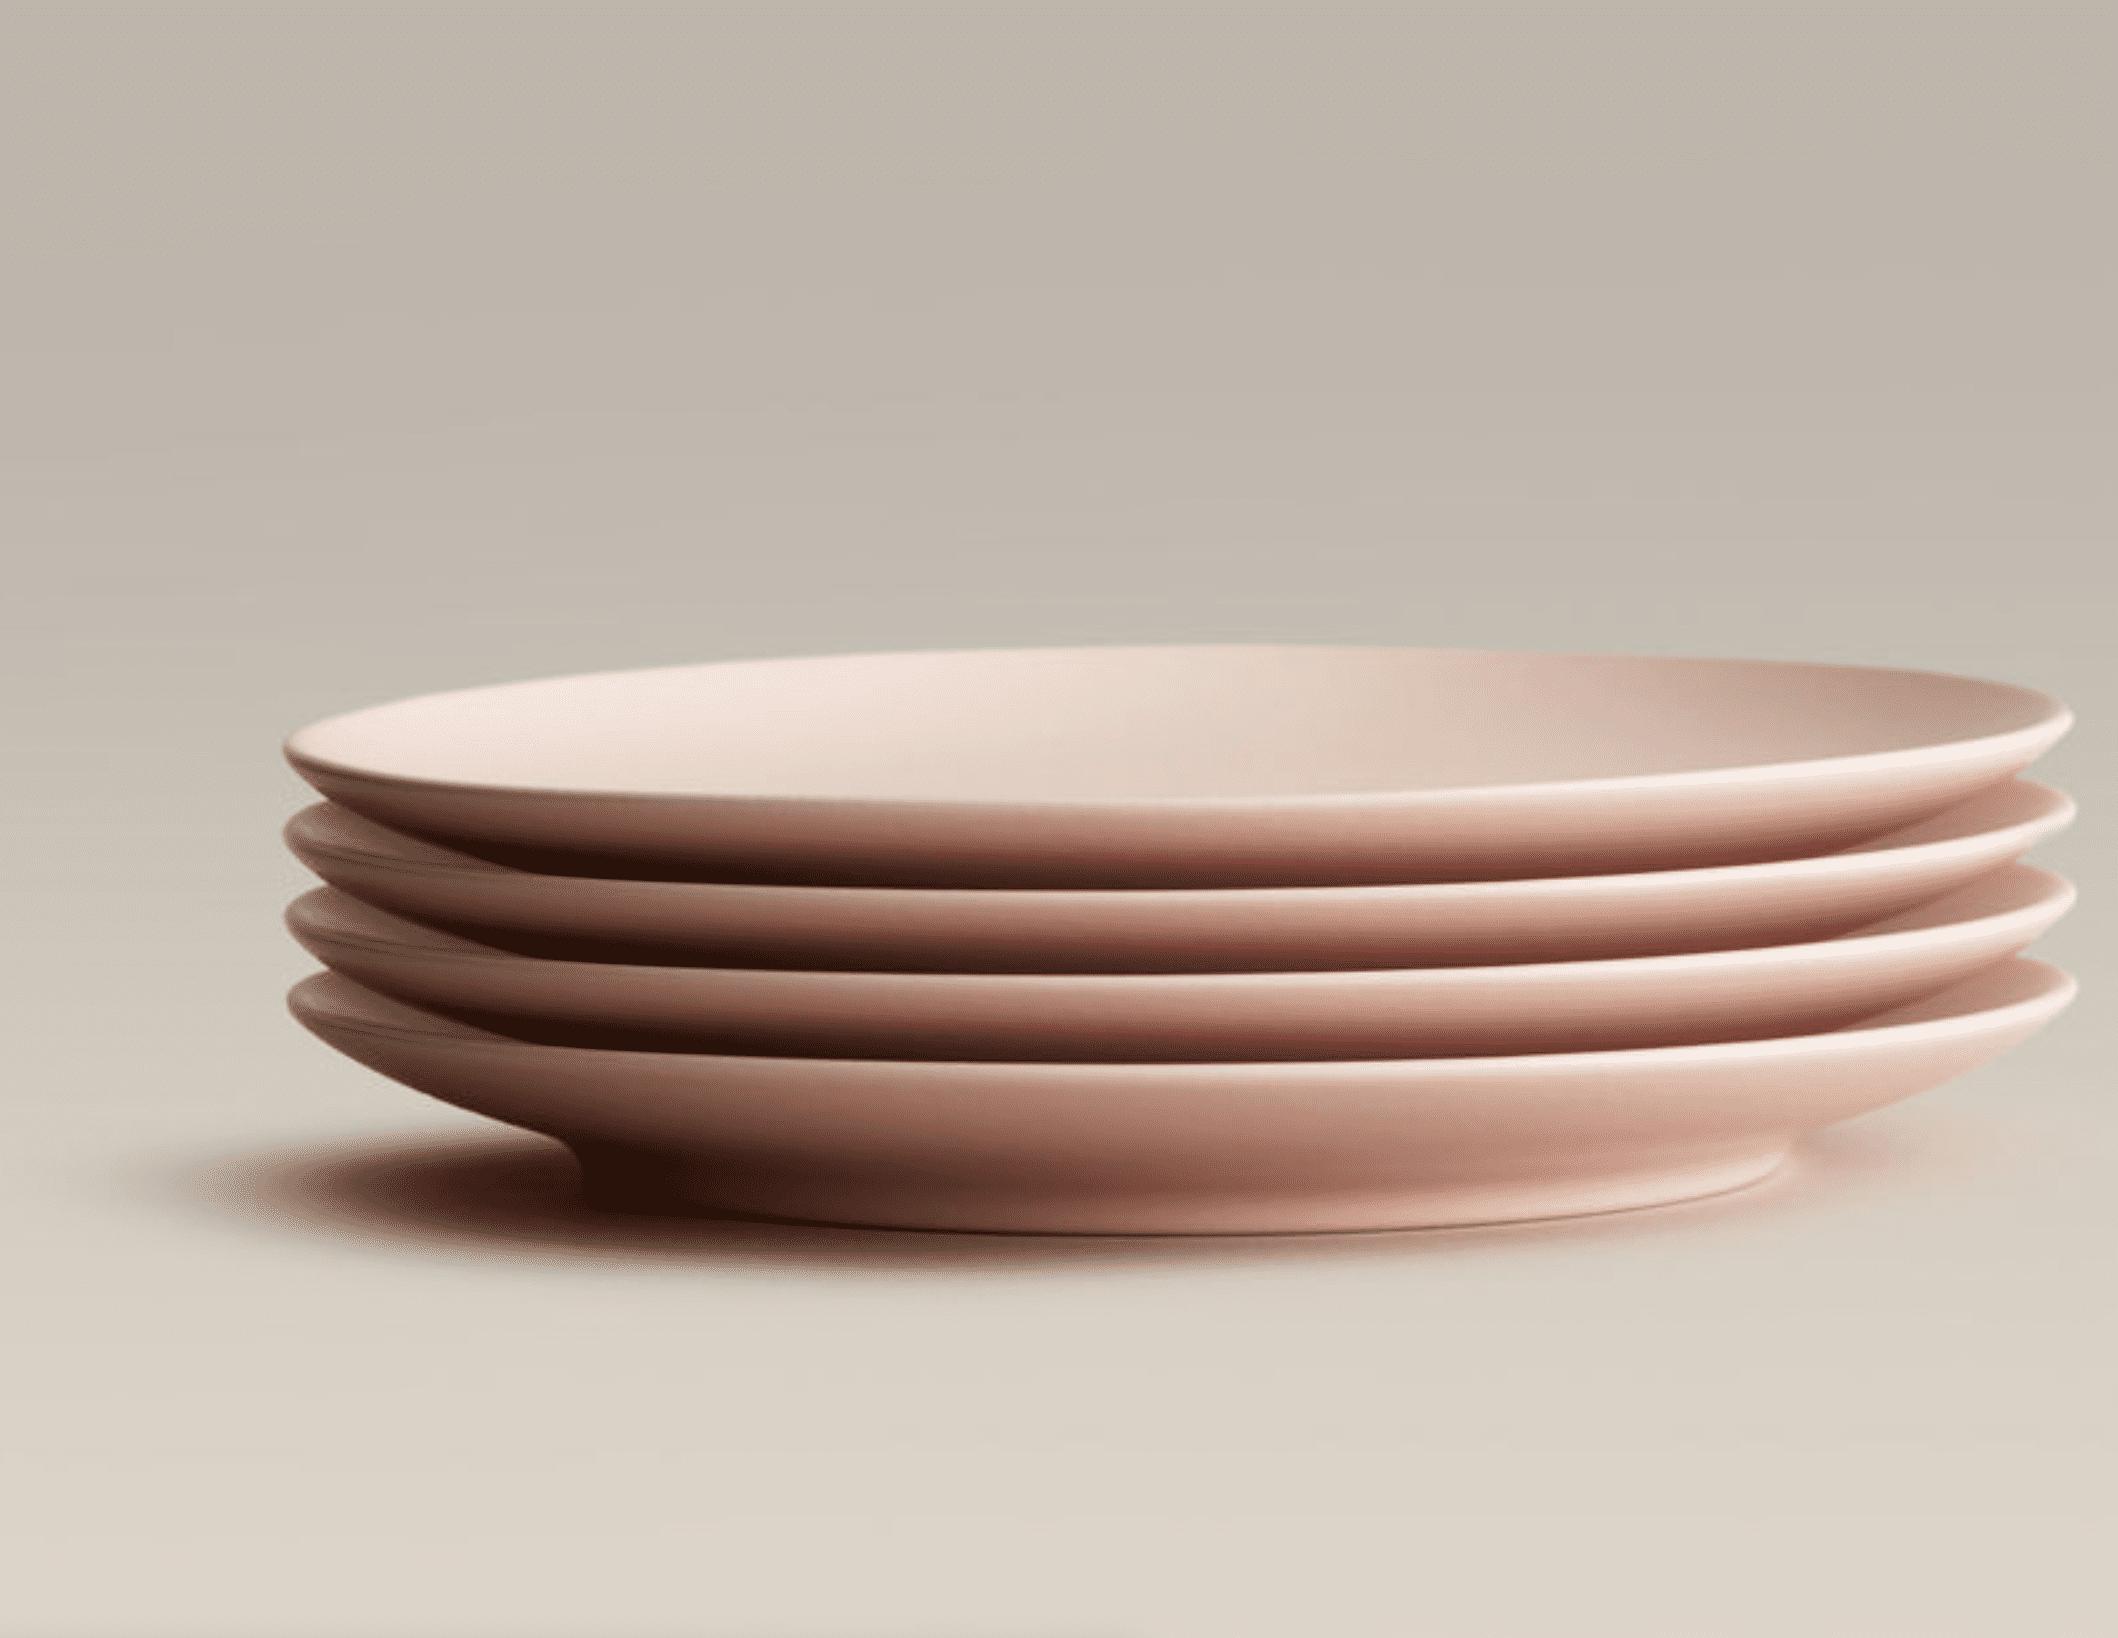 Big Plates, Set of 4